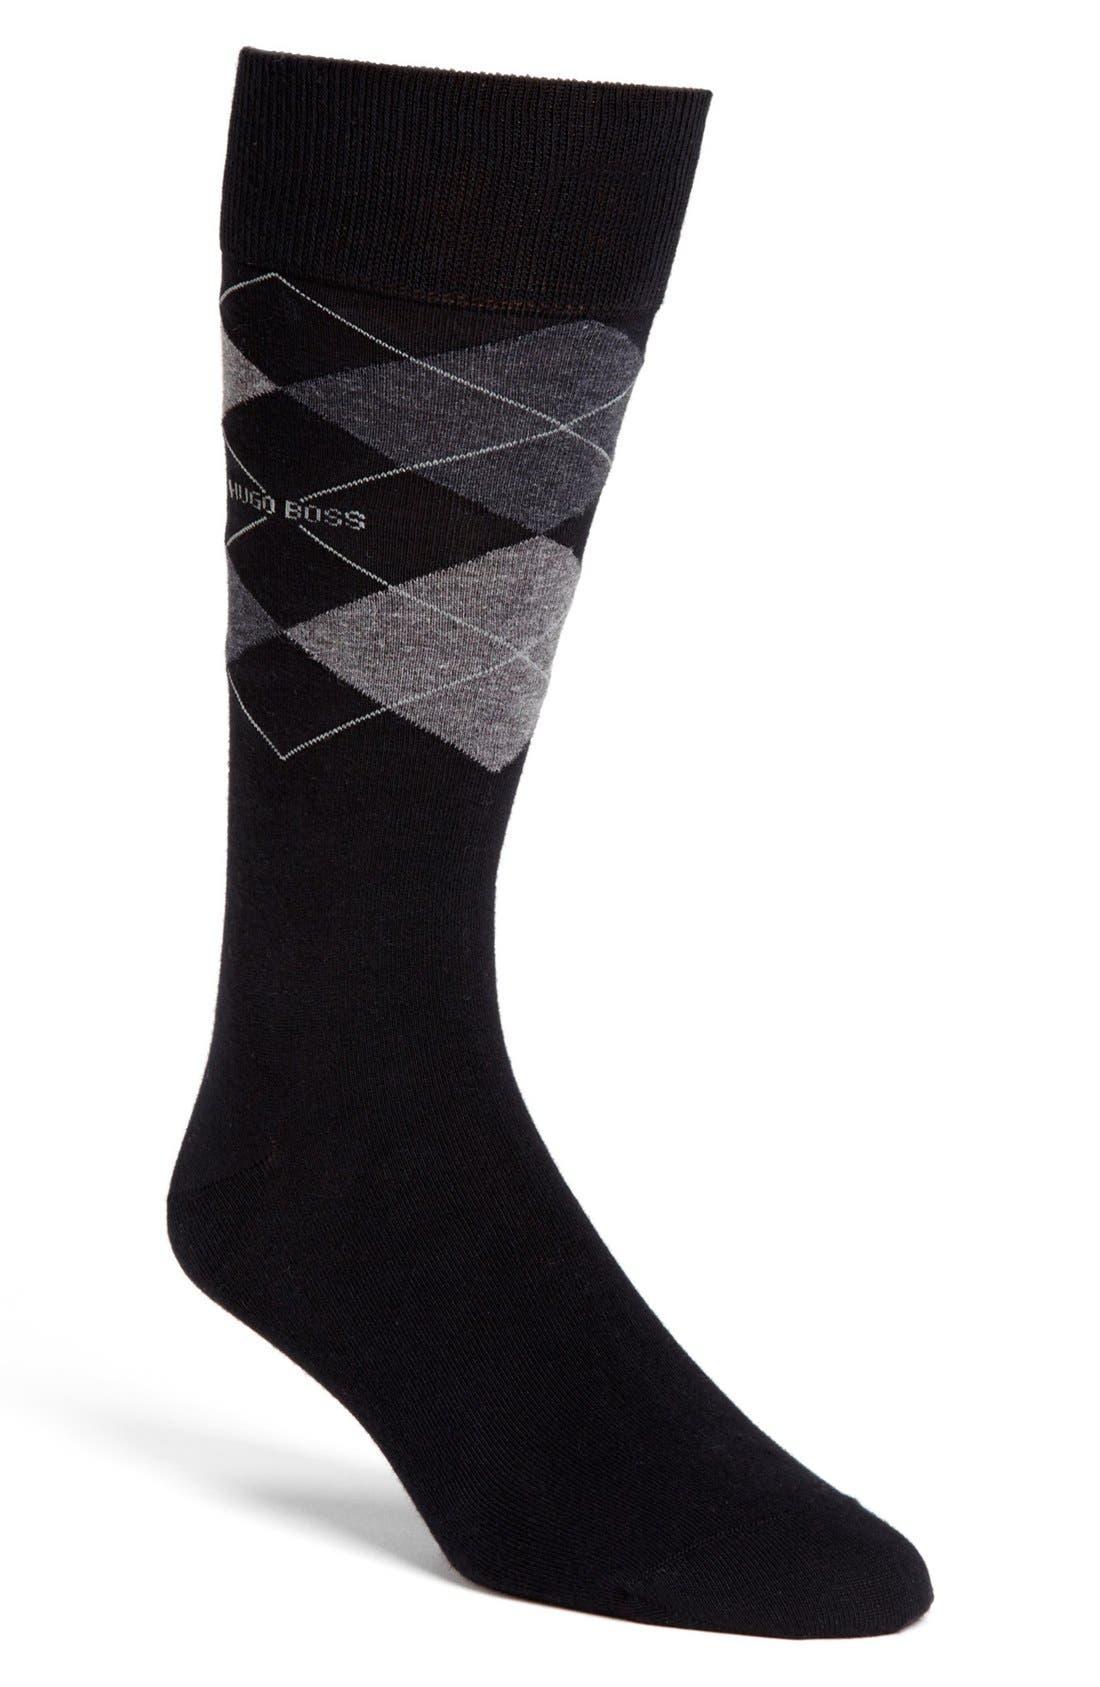 HUGO BOSS 'Dave' Socks, Main, color, 001